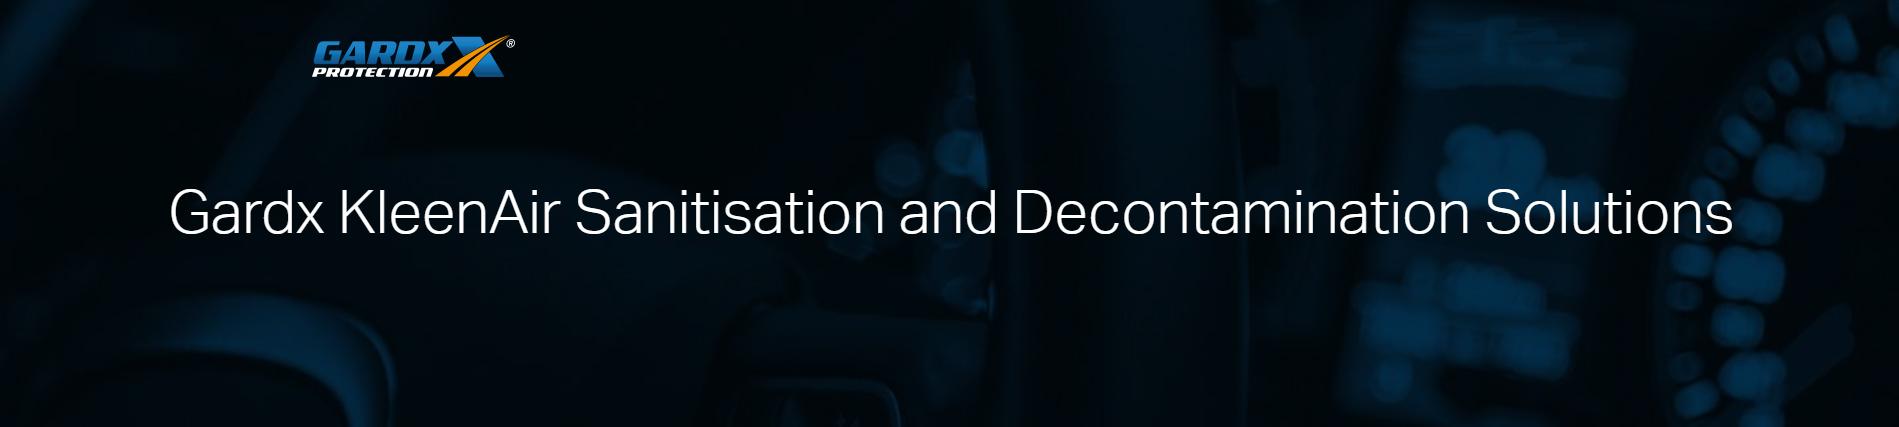 Gardx KleenAir Sanitisation and Decontamination Solutions